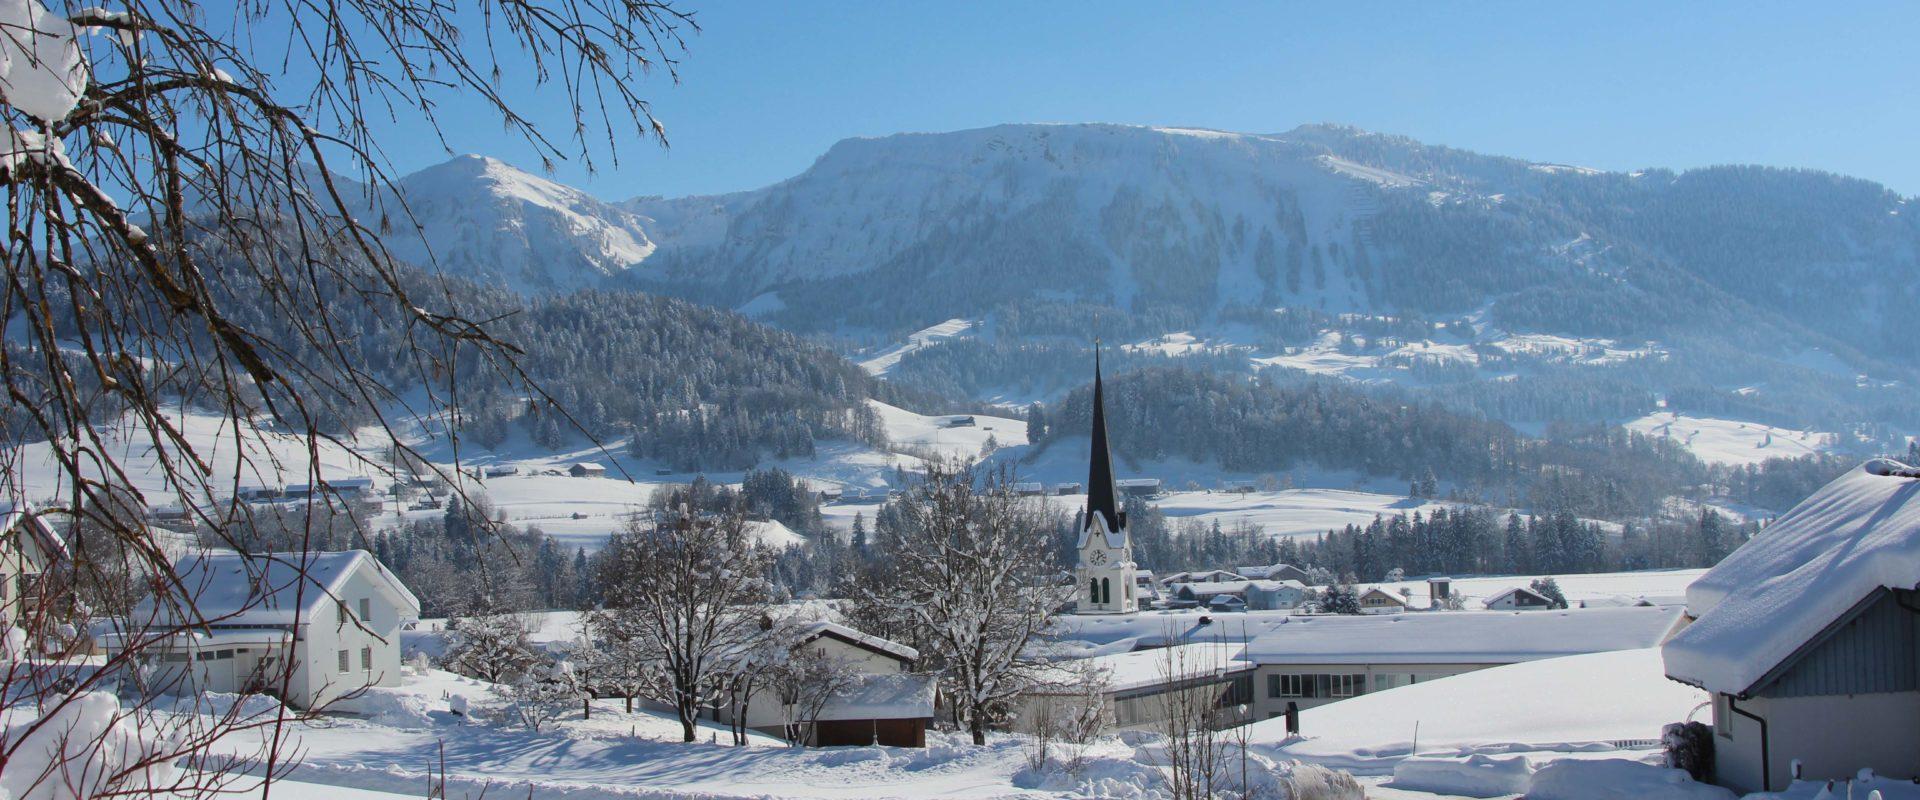 lingenau_winter (2)